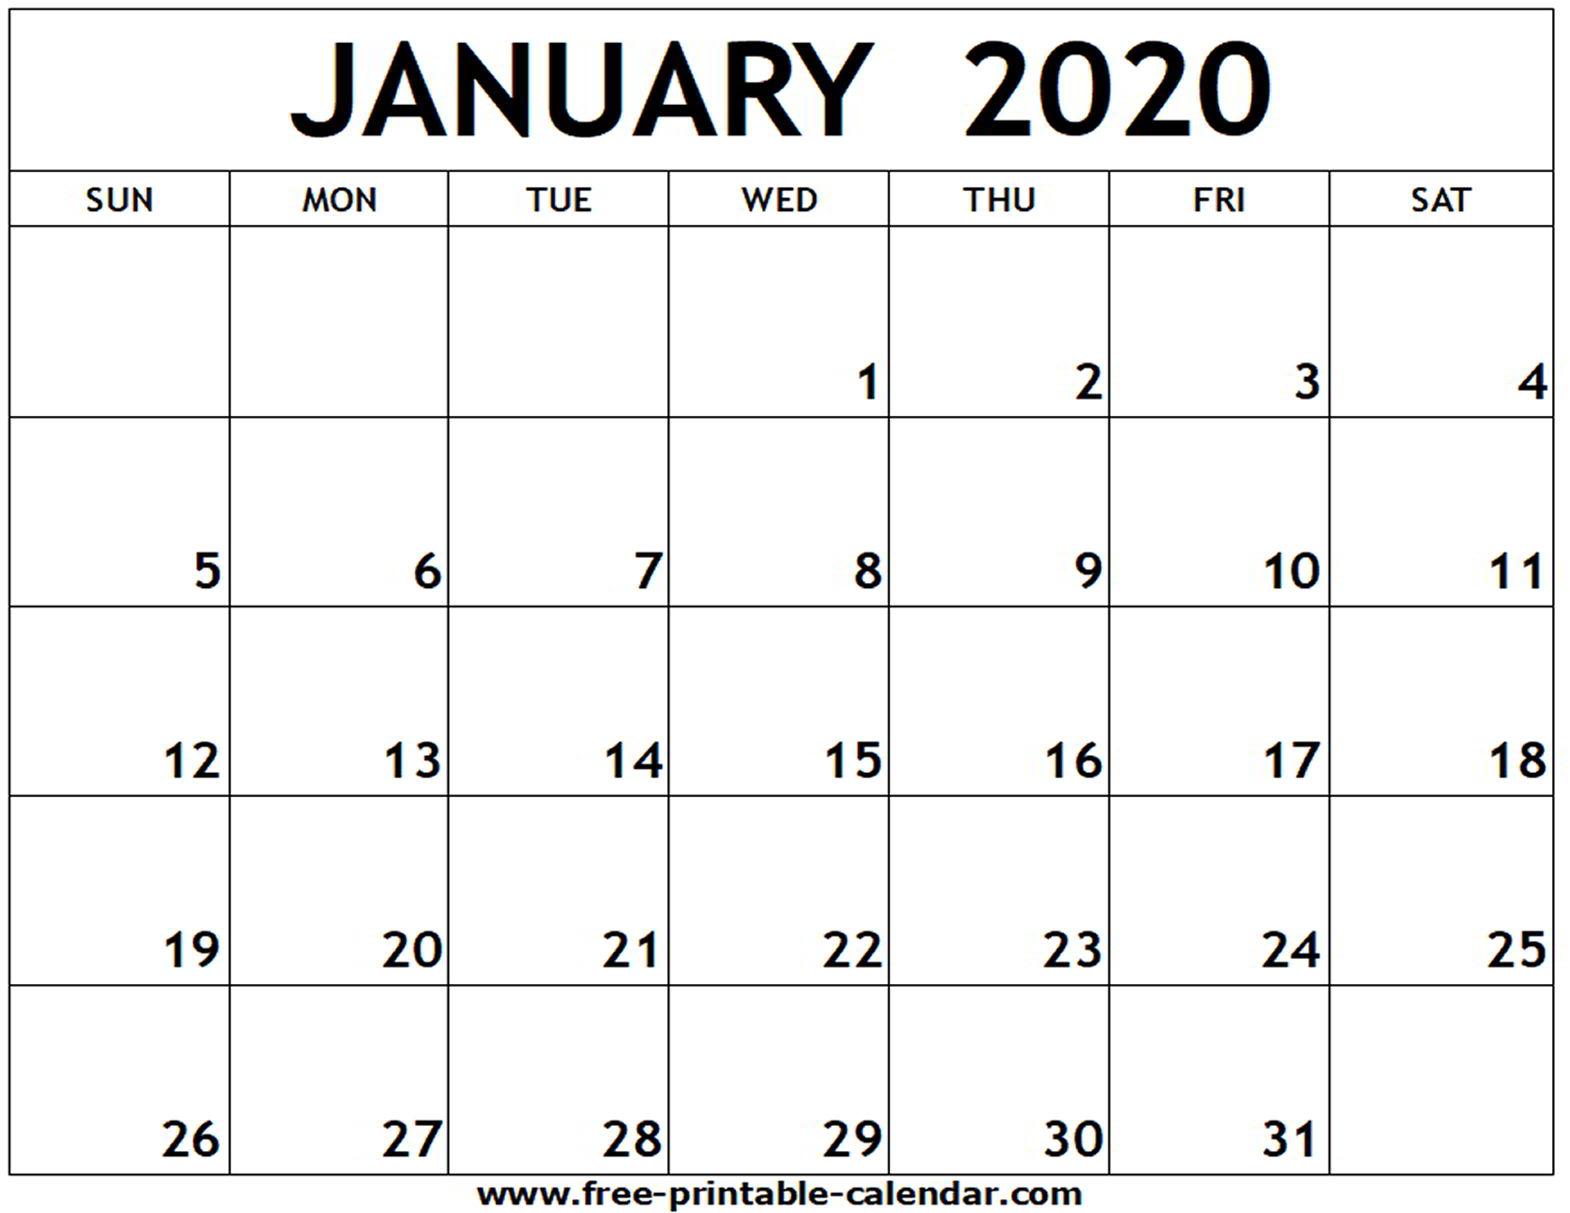 Print Blank Calendar 2020 - Togo.wpart.co